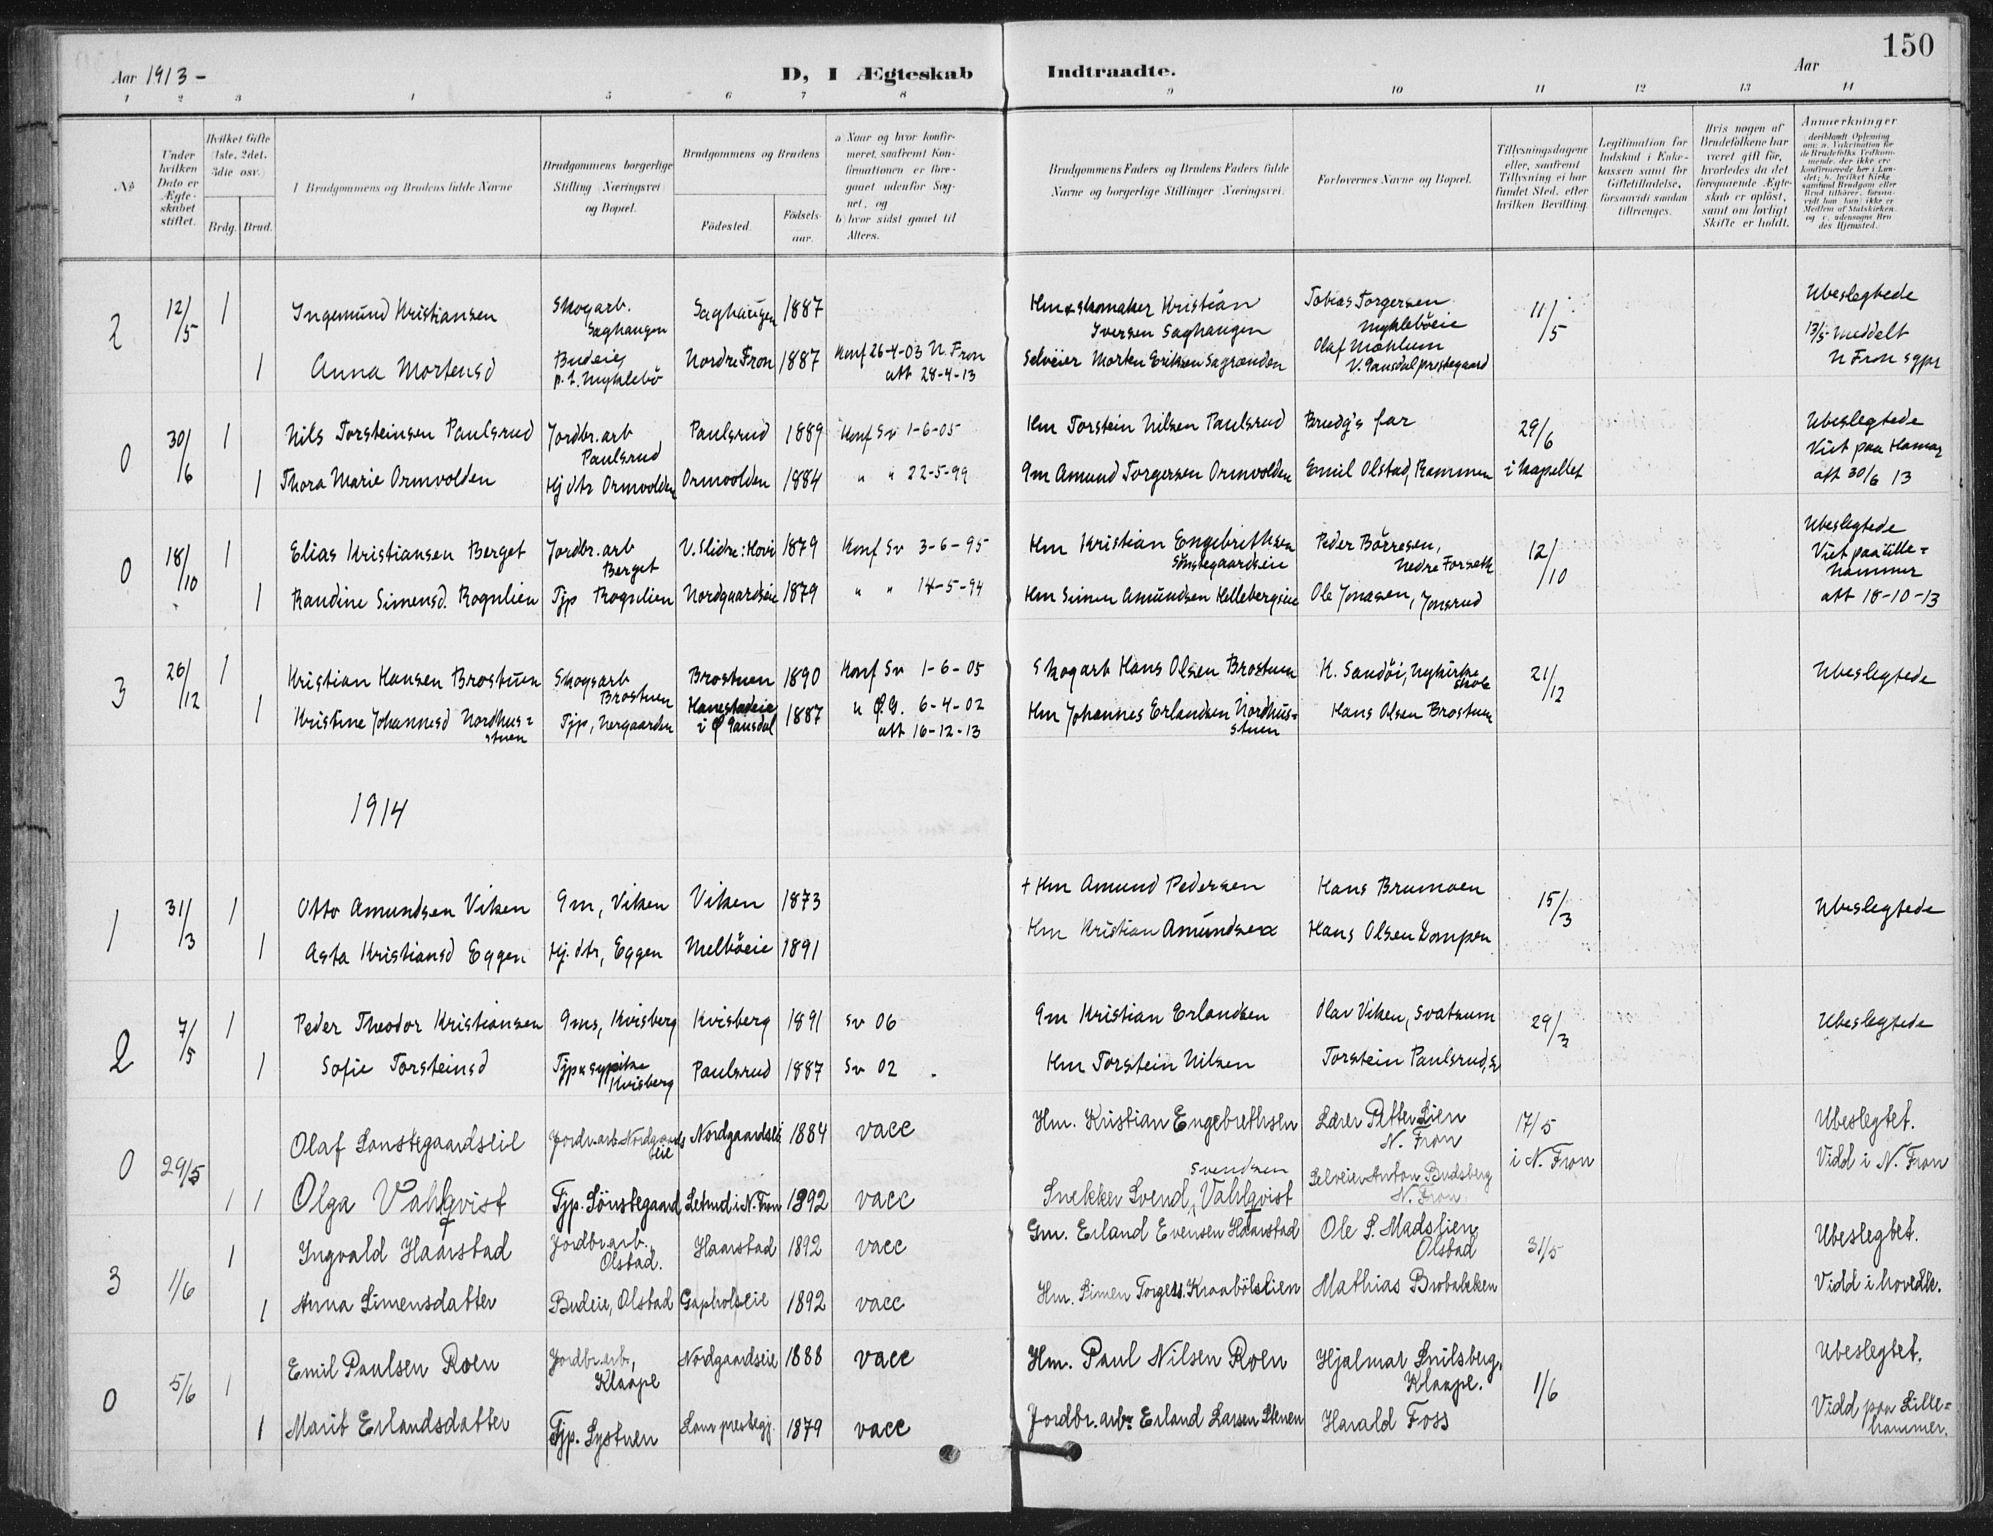 SAH, Vestre Gausdal prestekontor, Klokkerbok nr. 4, 1898-1939, s. 150